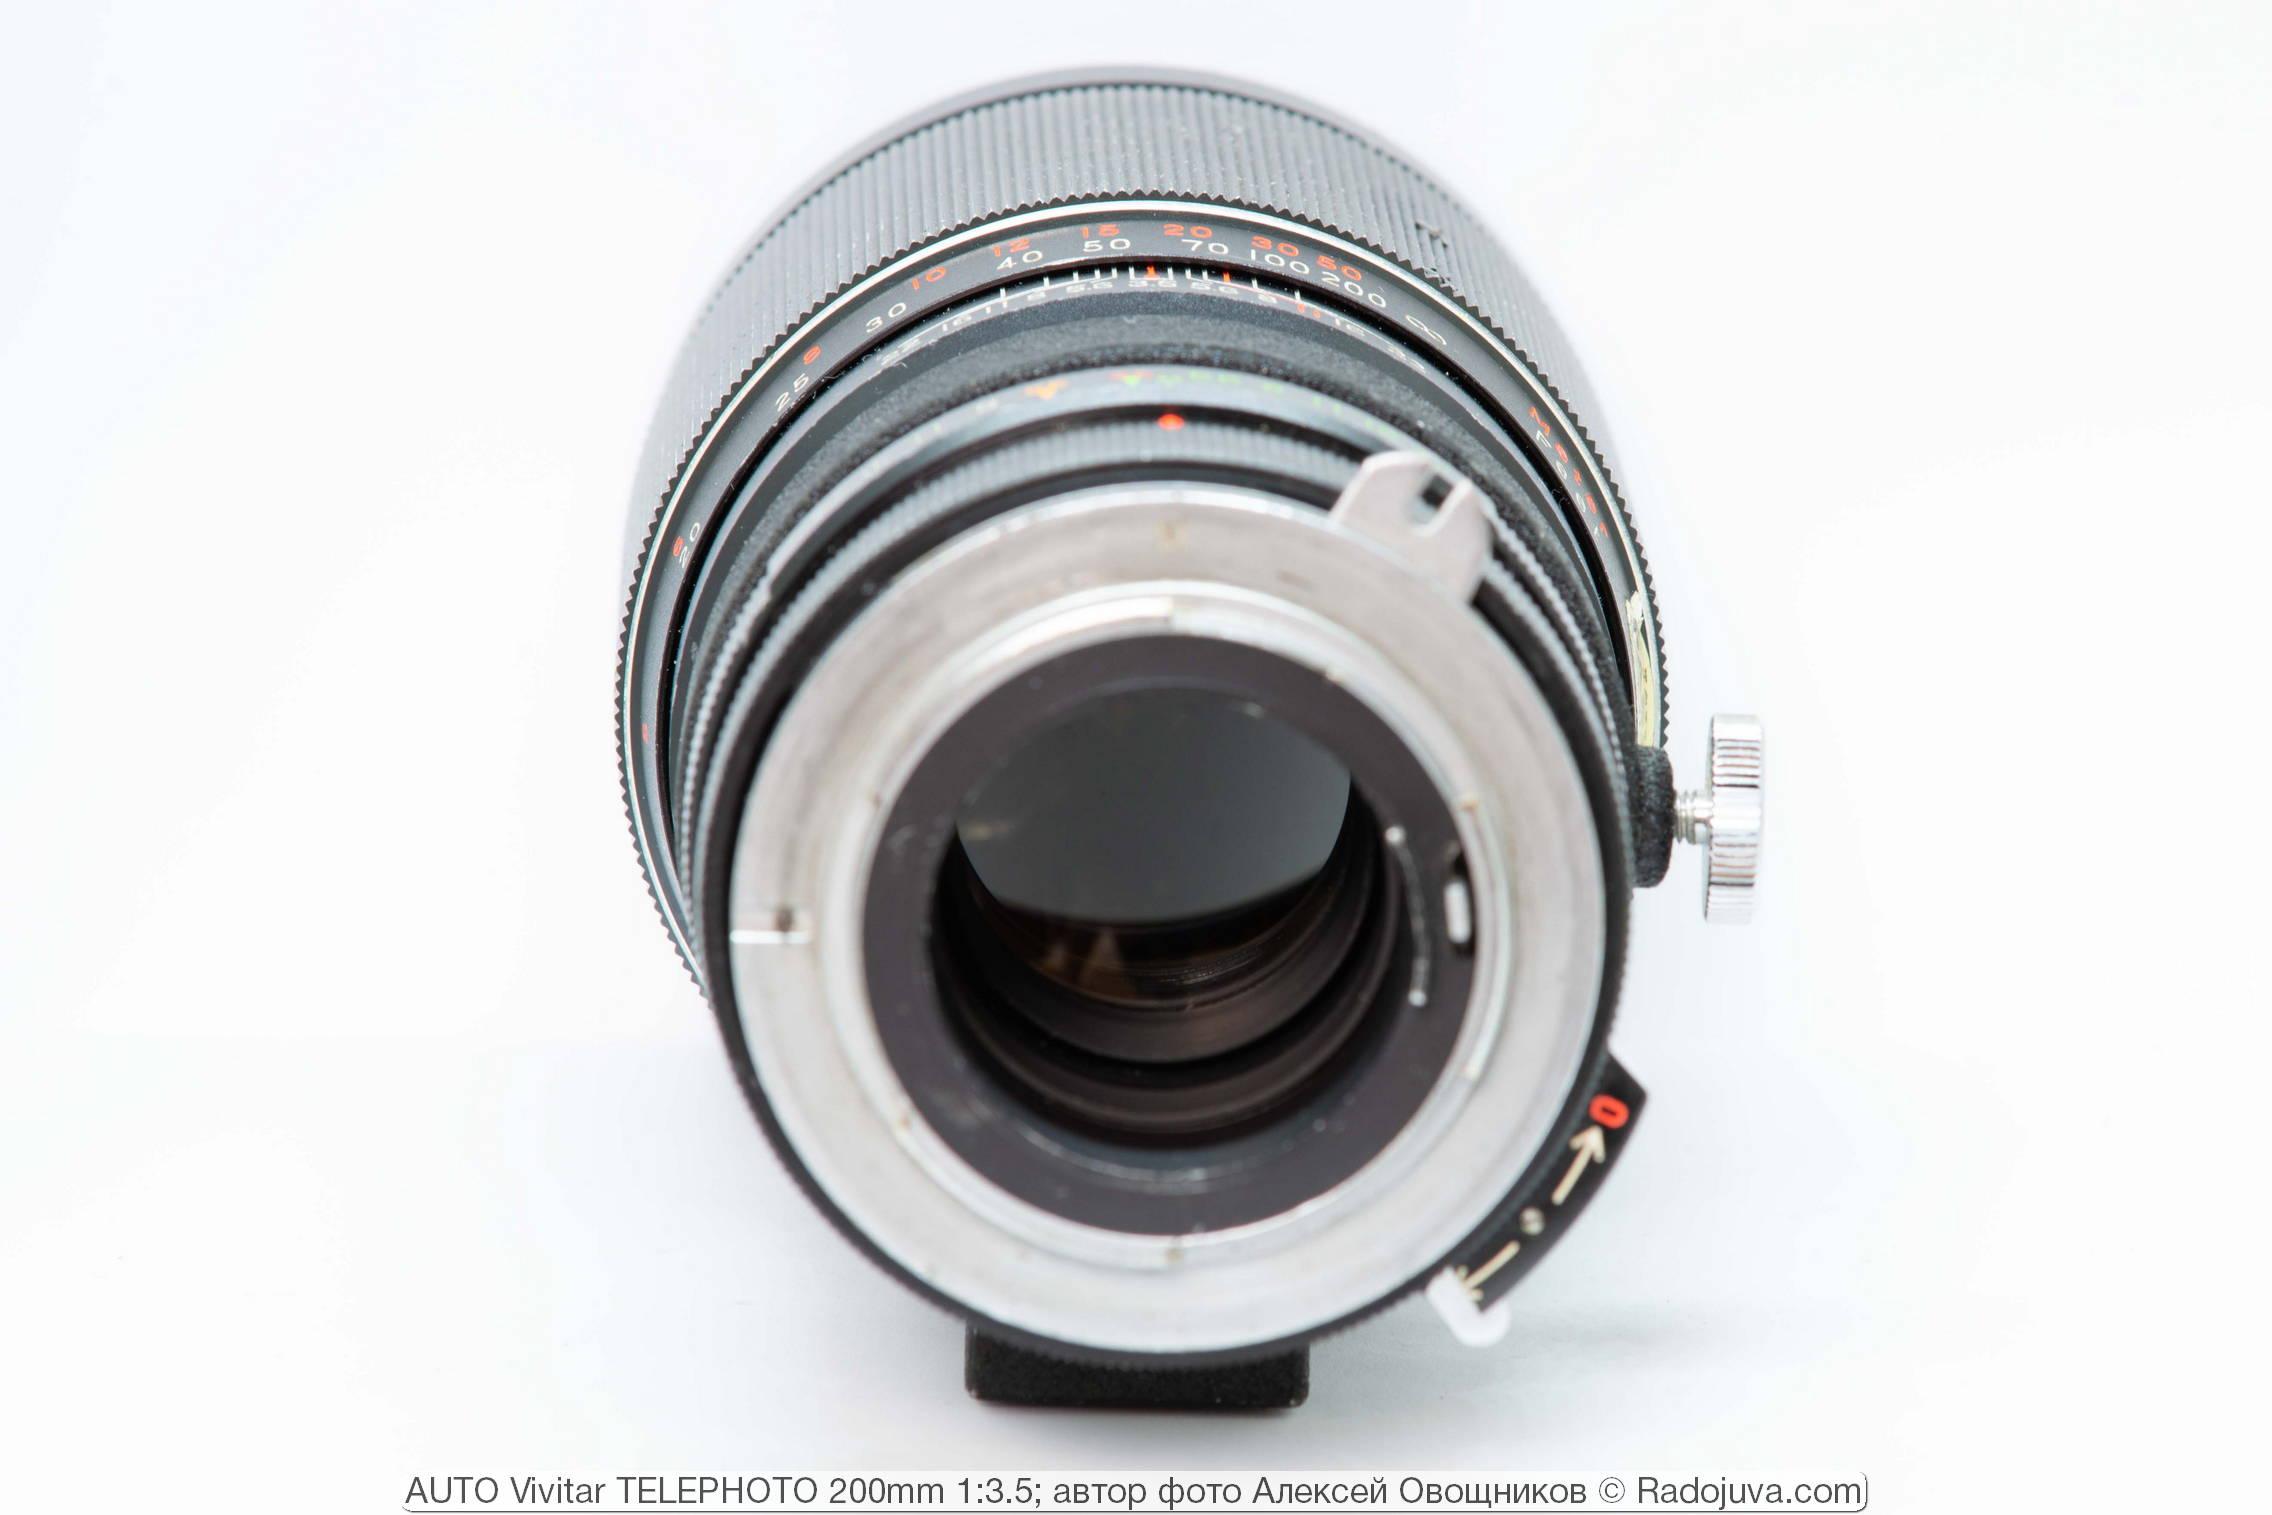 AUTO Vivitar TELEPHOTO 200mm 1:3.5